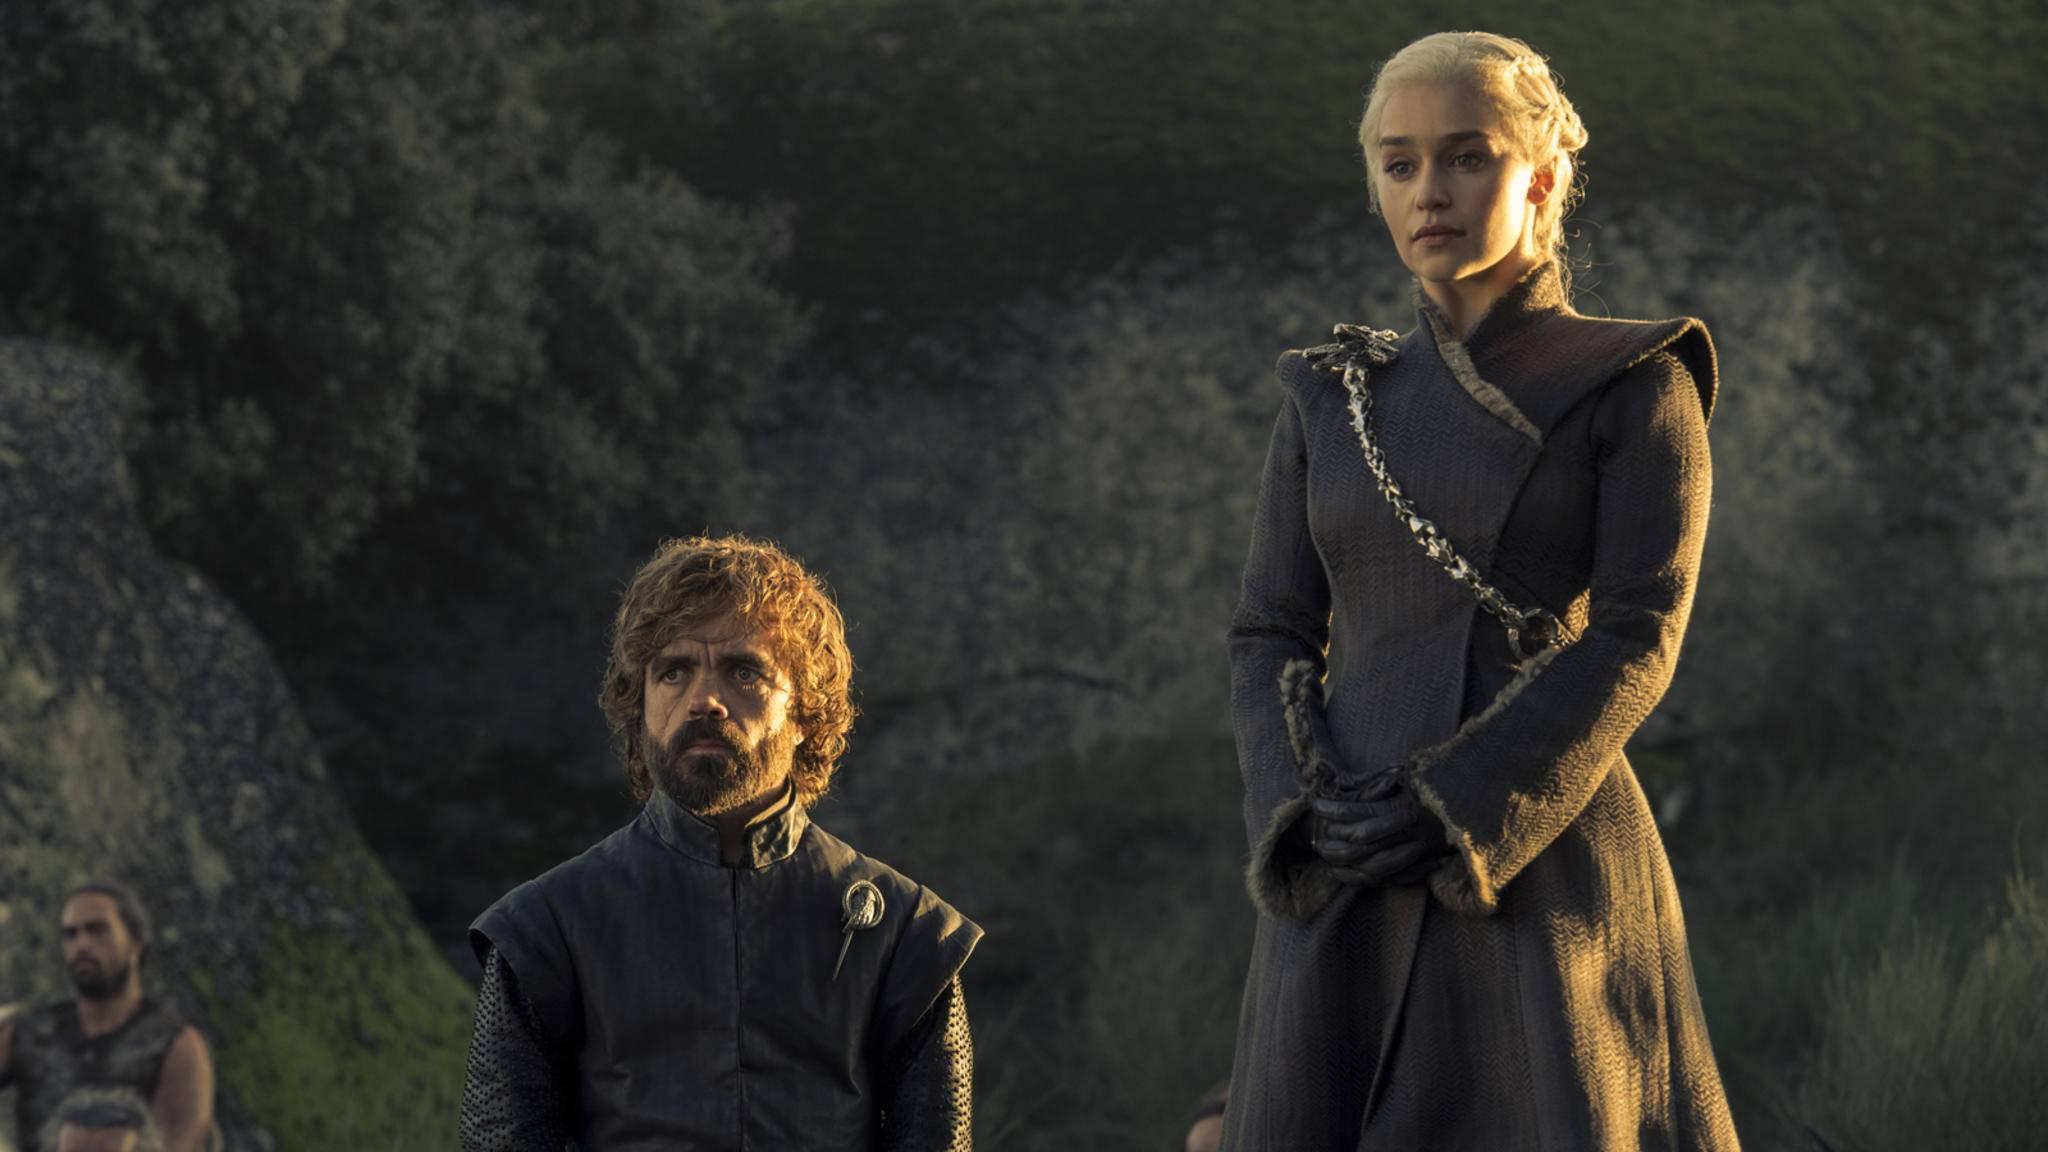 Tyrion zweifelt langsam an den Methoden von Daenerys Targaryen.